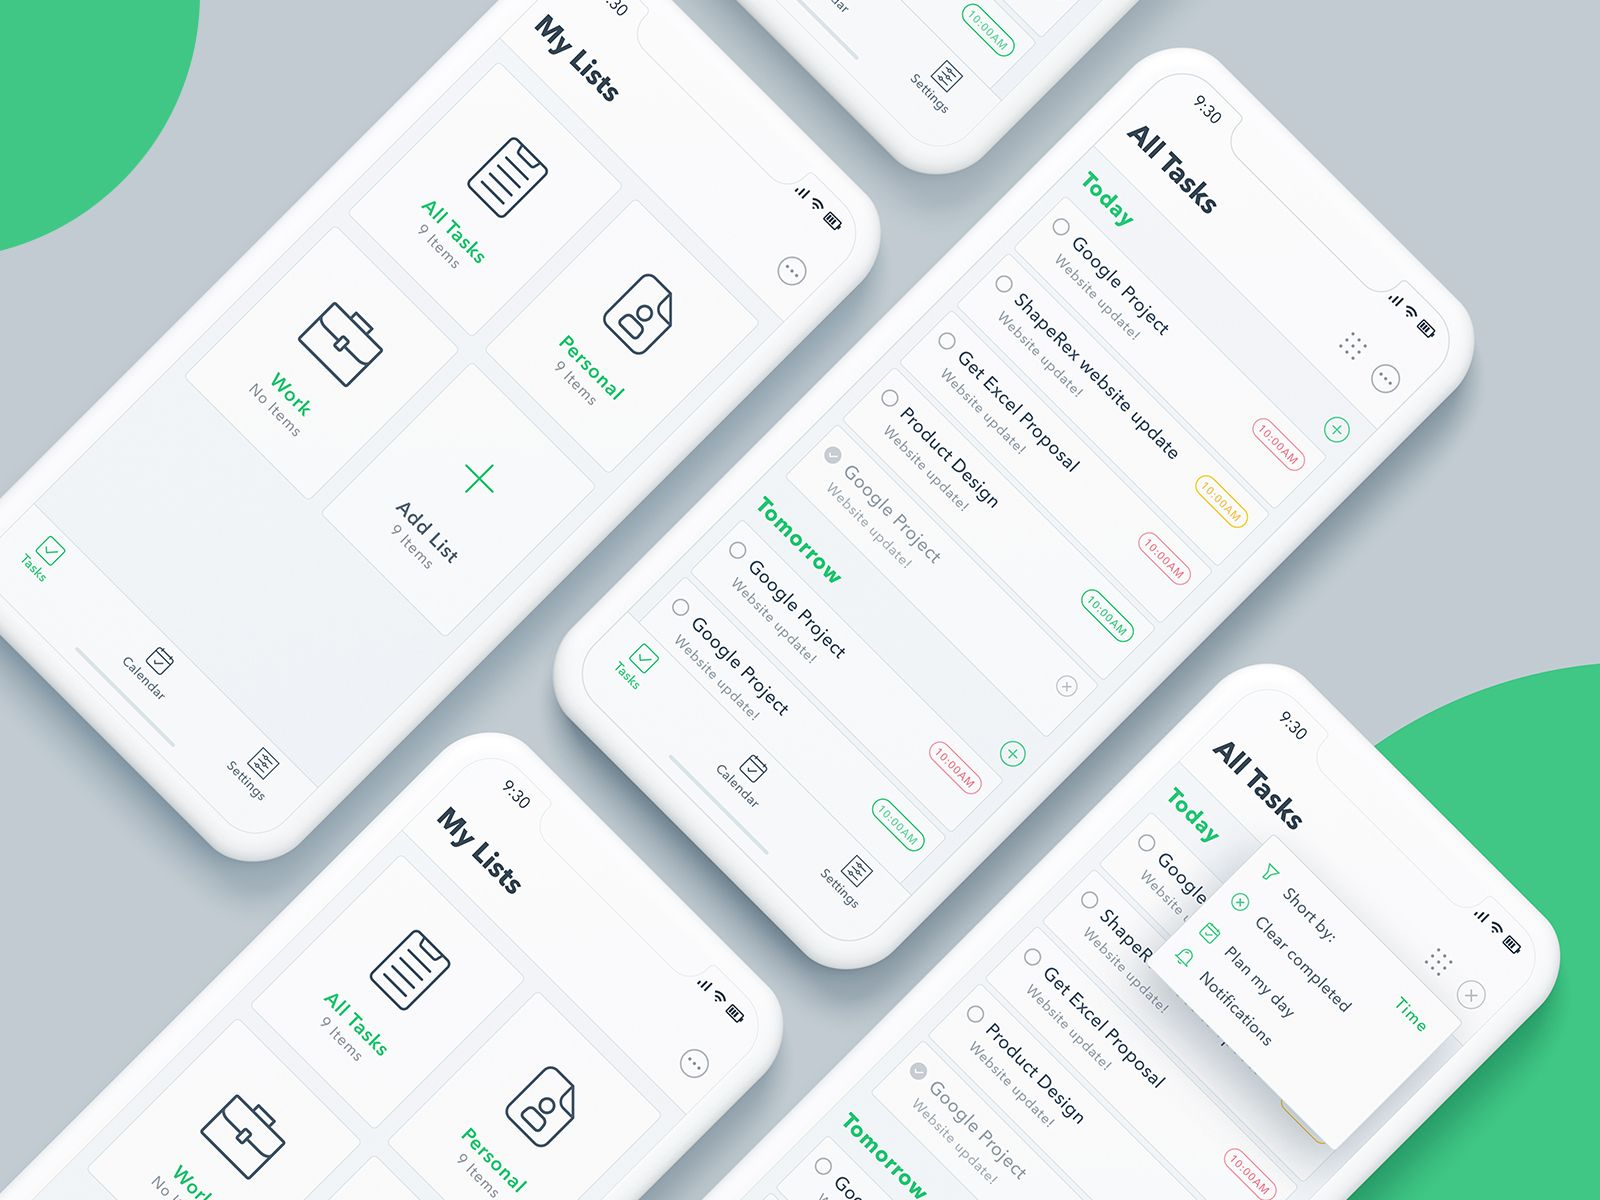 To Do Task List App Reminder Checklist Task List Task App Android App Android App Design To Do Task To Design De Aplicativos Design De Apps Design De Interface